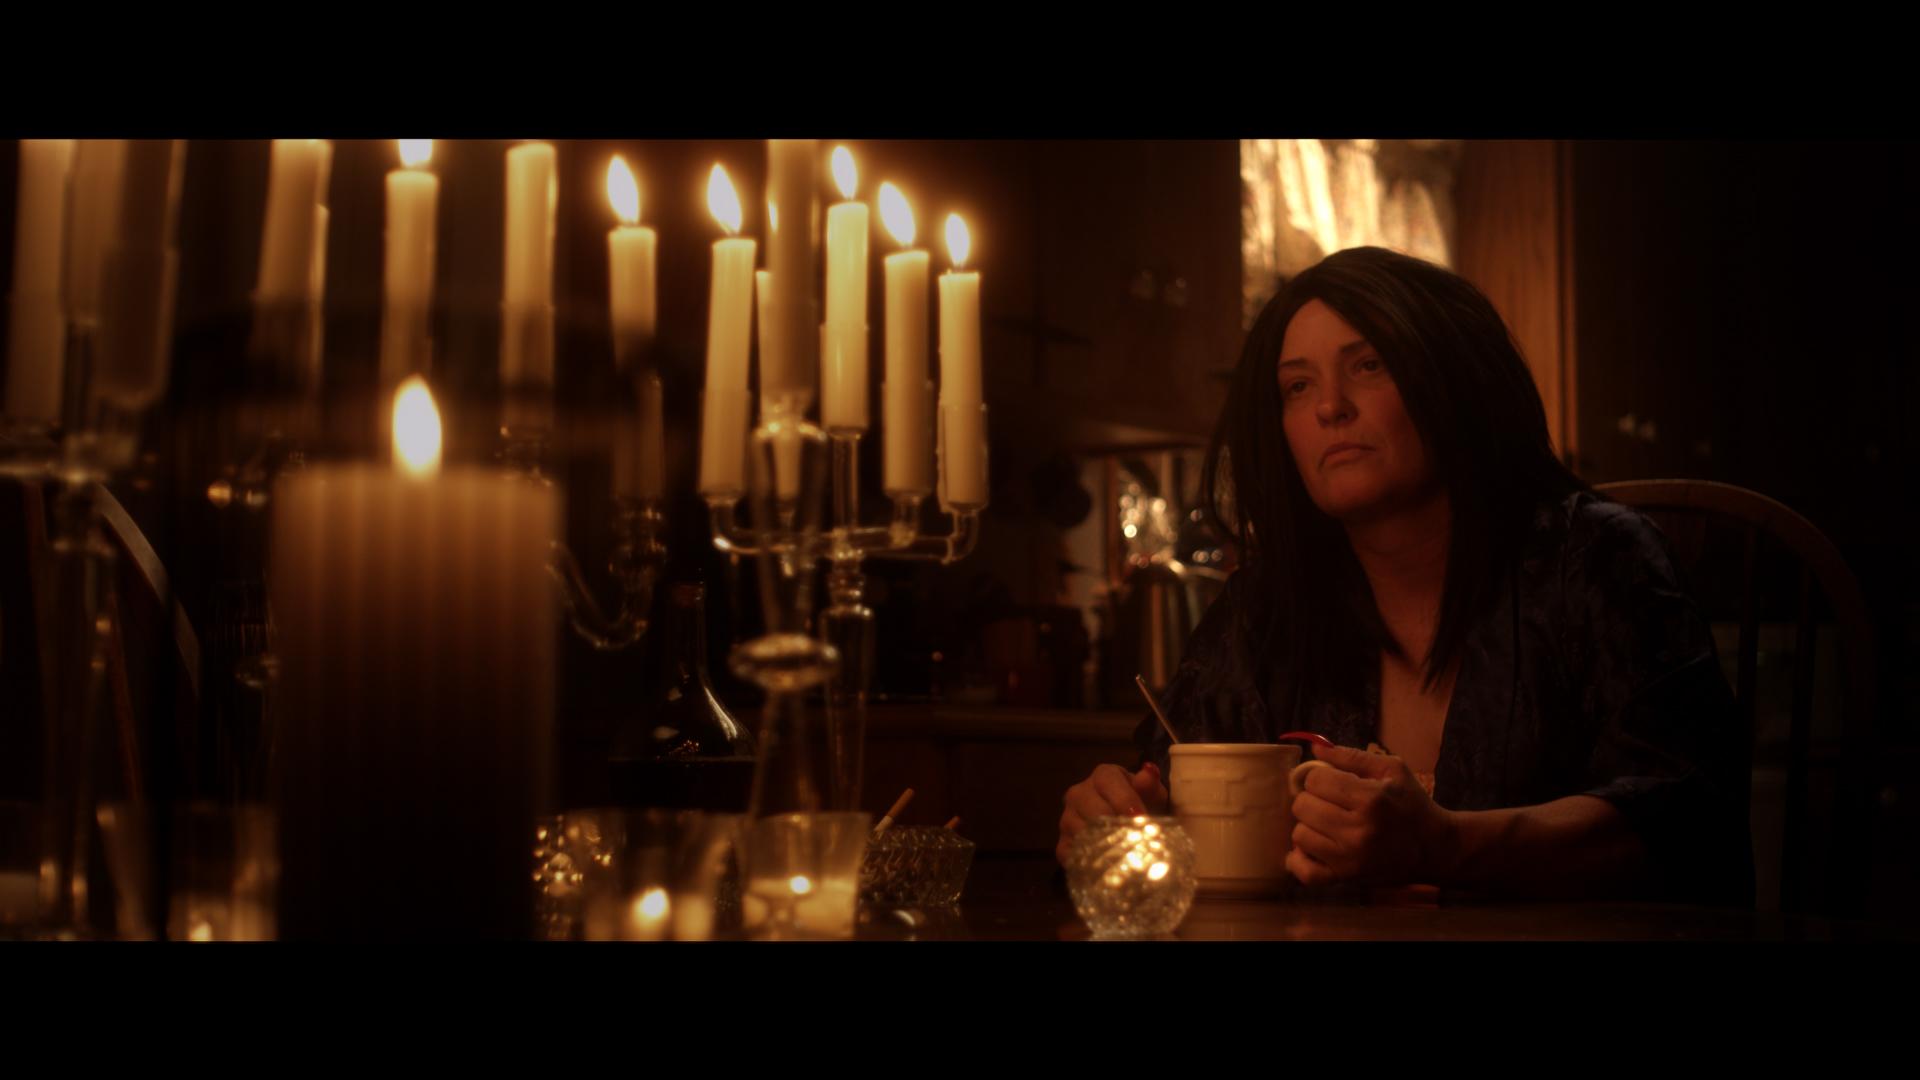 Morian holding mug at candlelit table, reminiscing.jpg